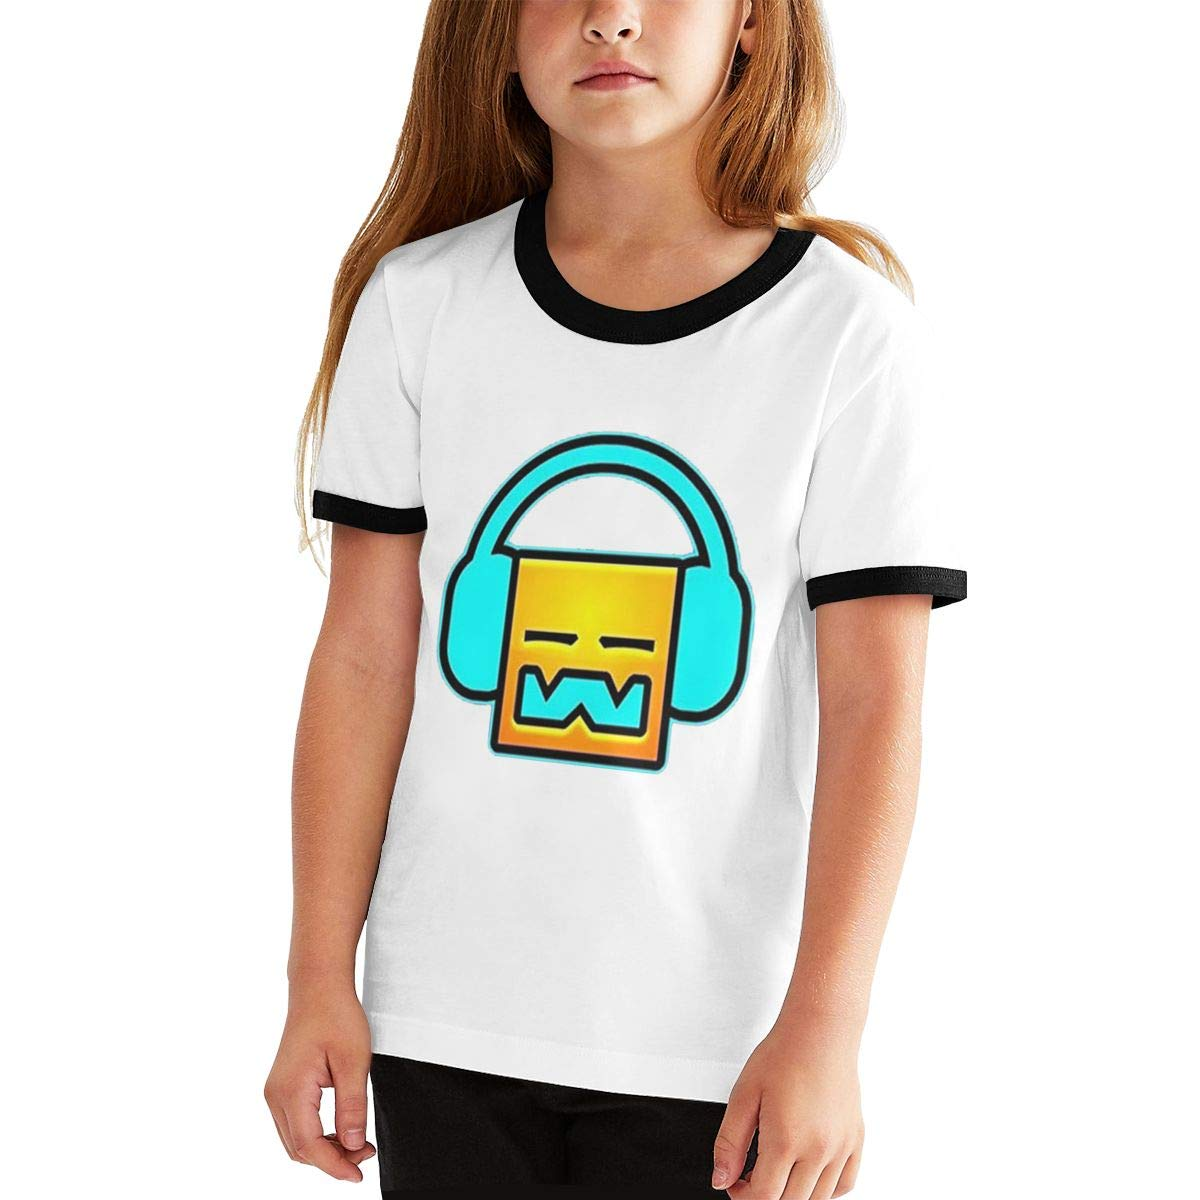 Monicame Teens Geometry Dash Leisure Comfortable T-Shirt Short Sleeve